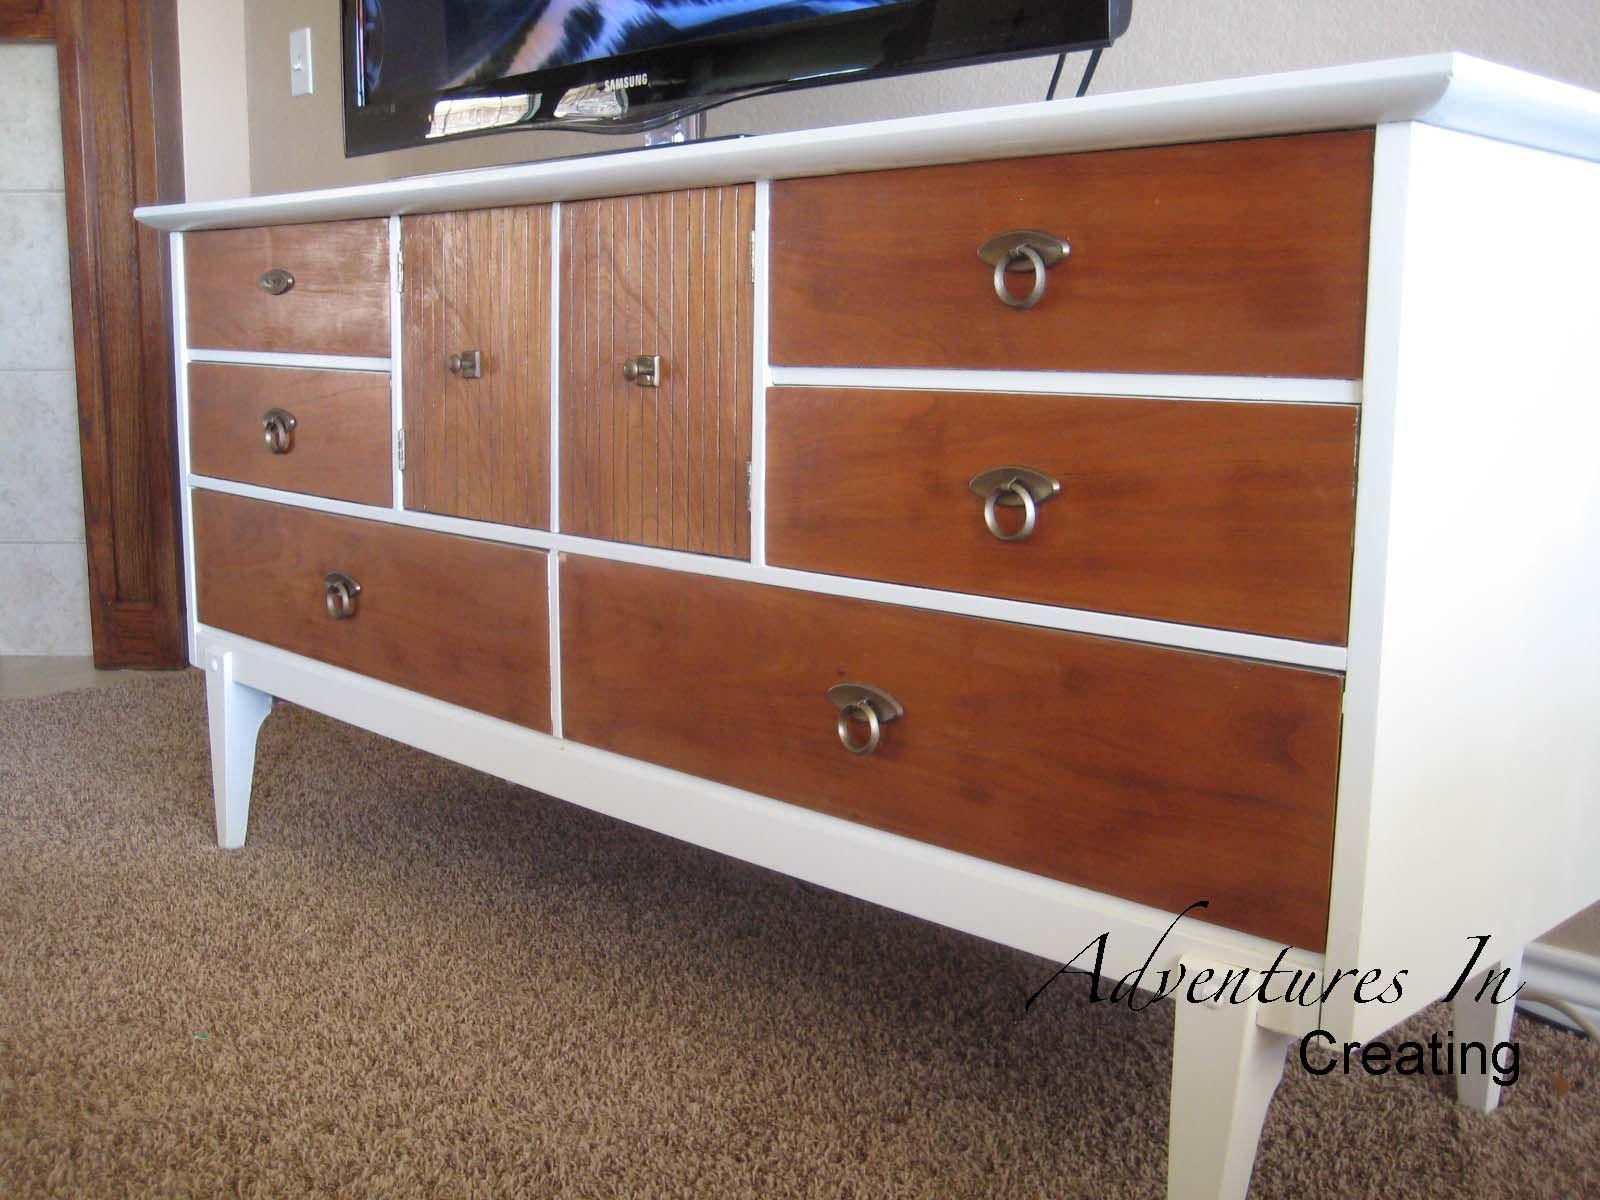 La Credenza Muebles : Credenza #wood #stain #furniture #diy hobby pinterest muebles